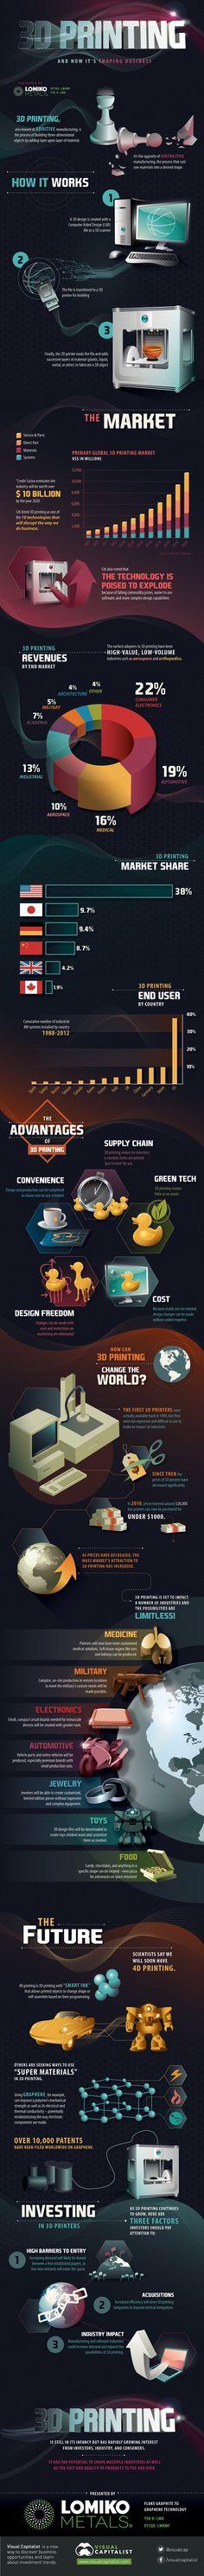 3D Printing_10